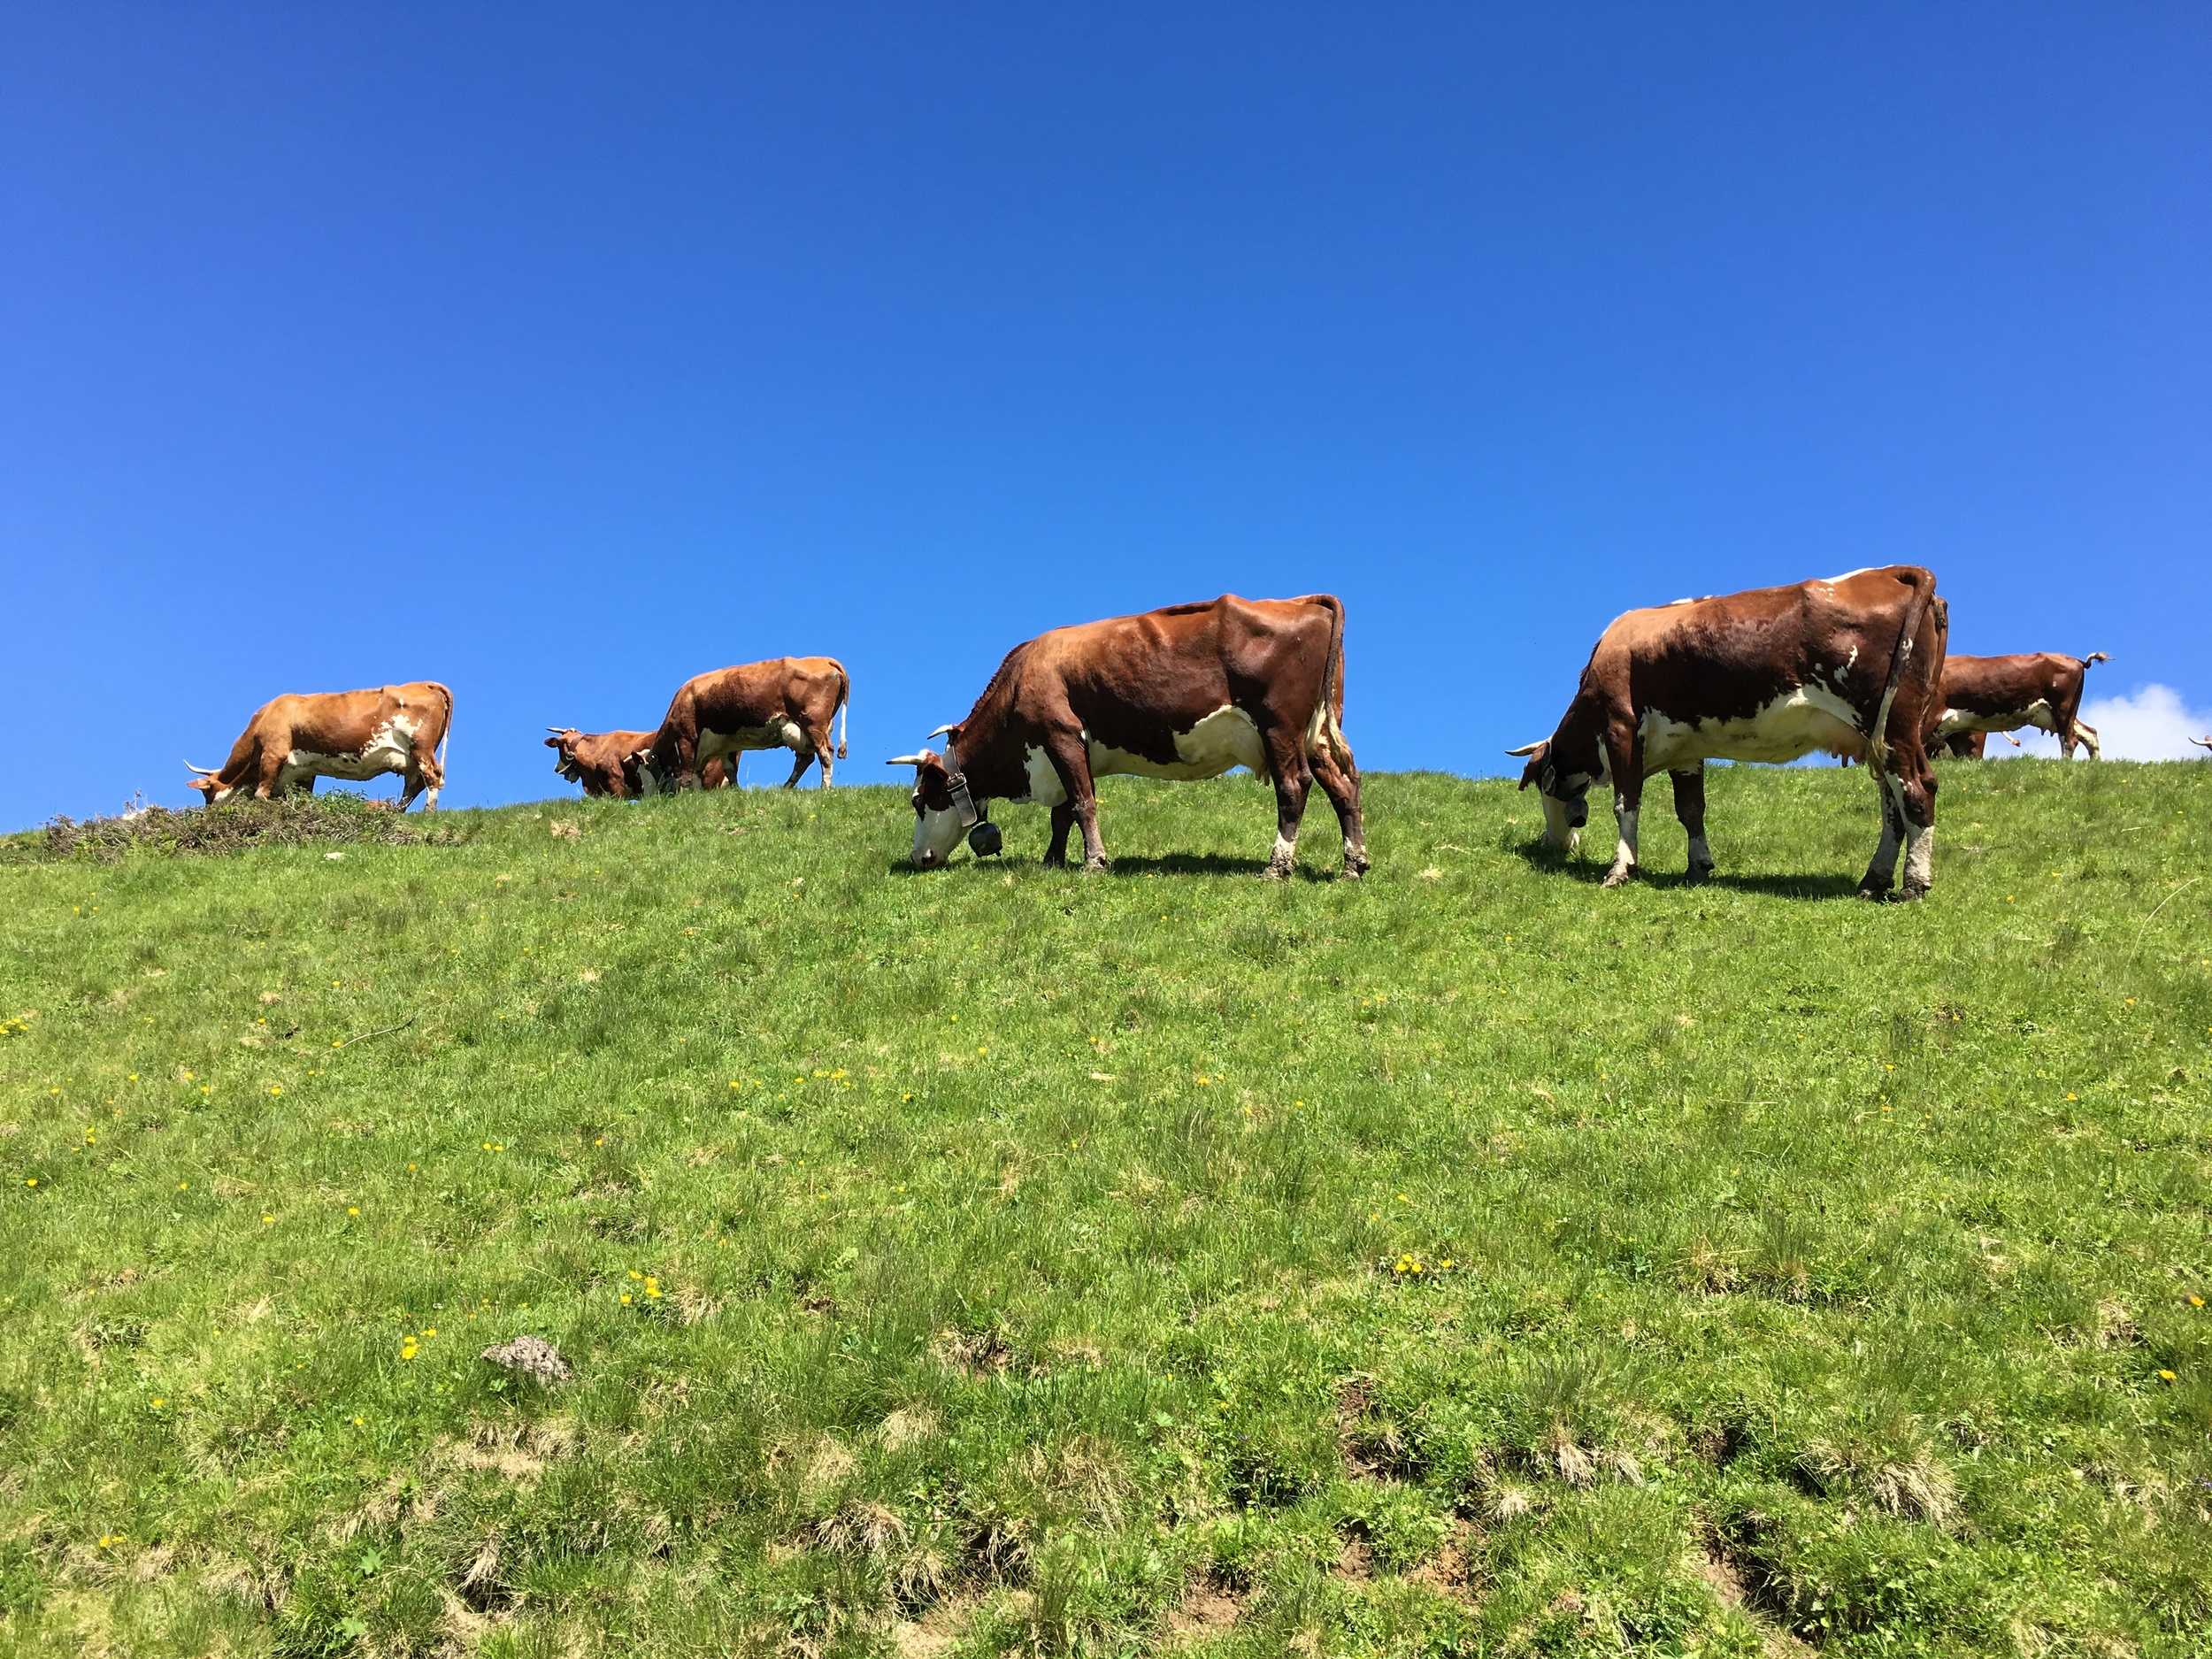 Cows.  Behaving like mountain goats.